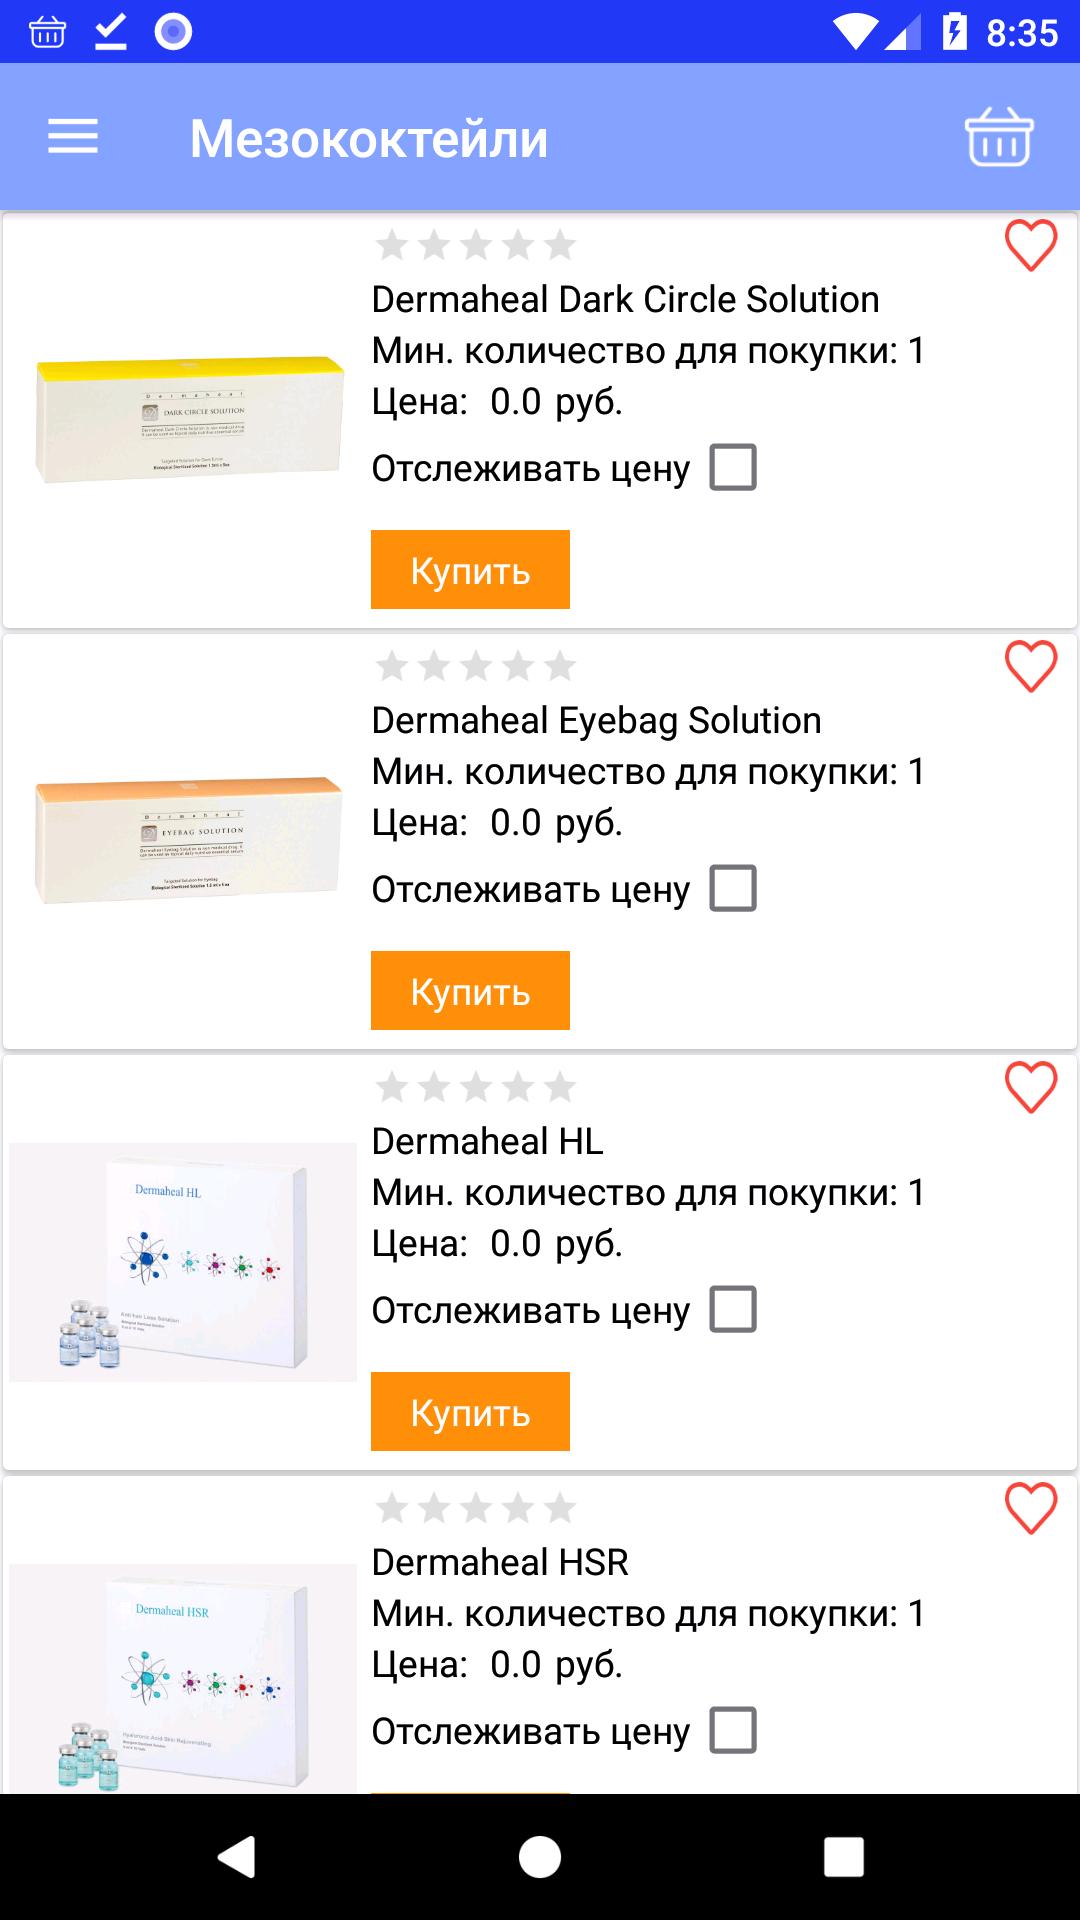 Доработка мобильного android-приложения за 300 000 рублей фото f_0675bbe091de5432.png